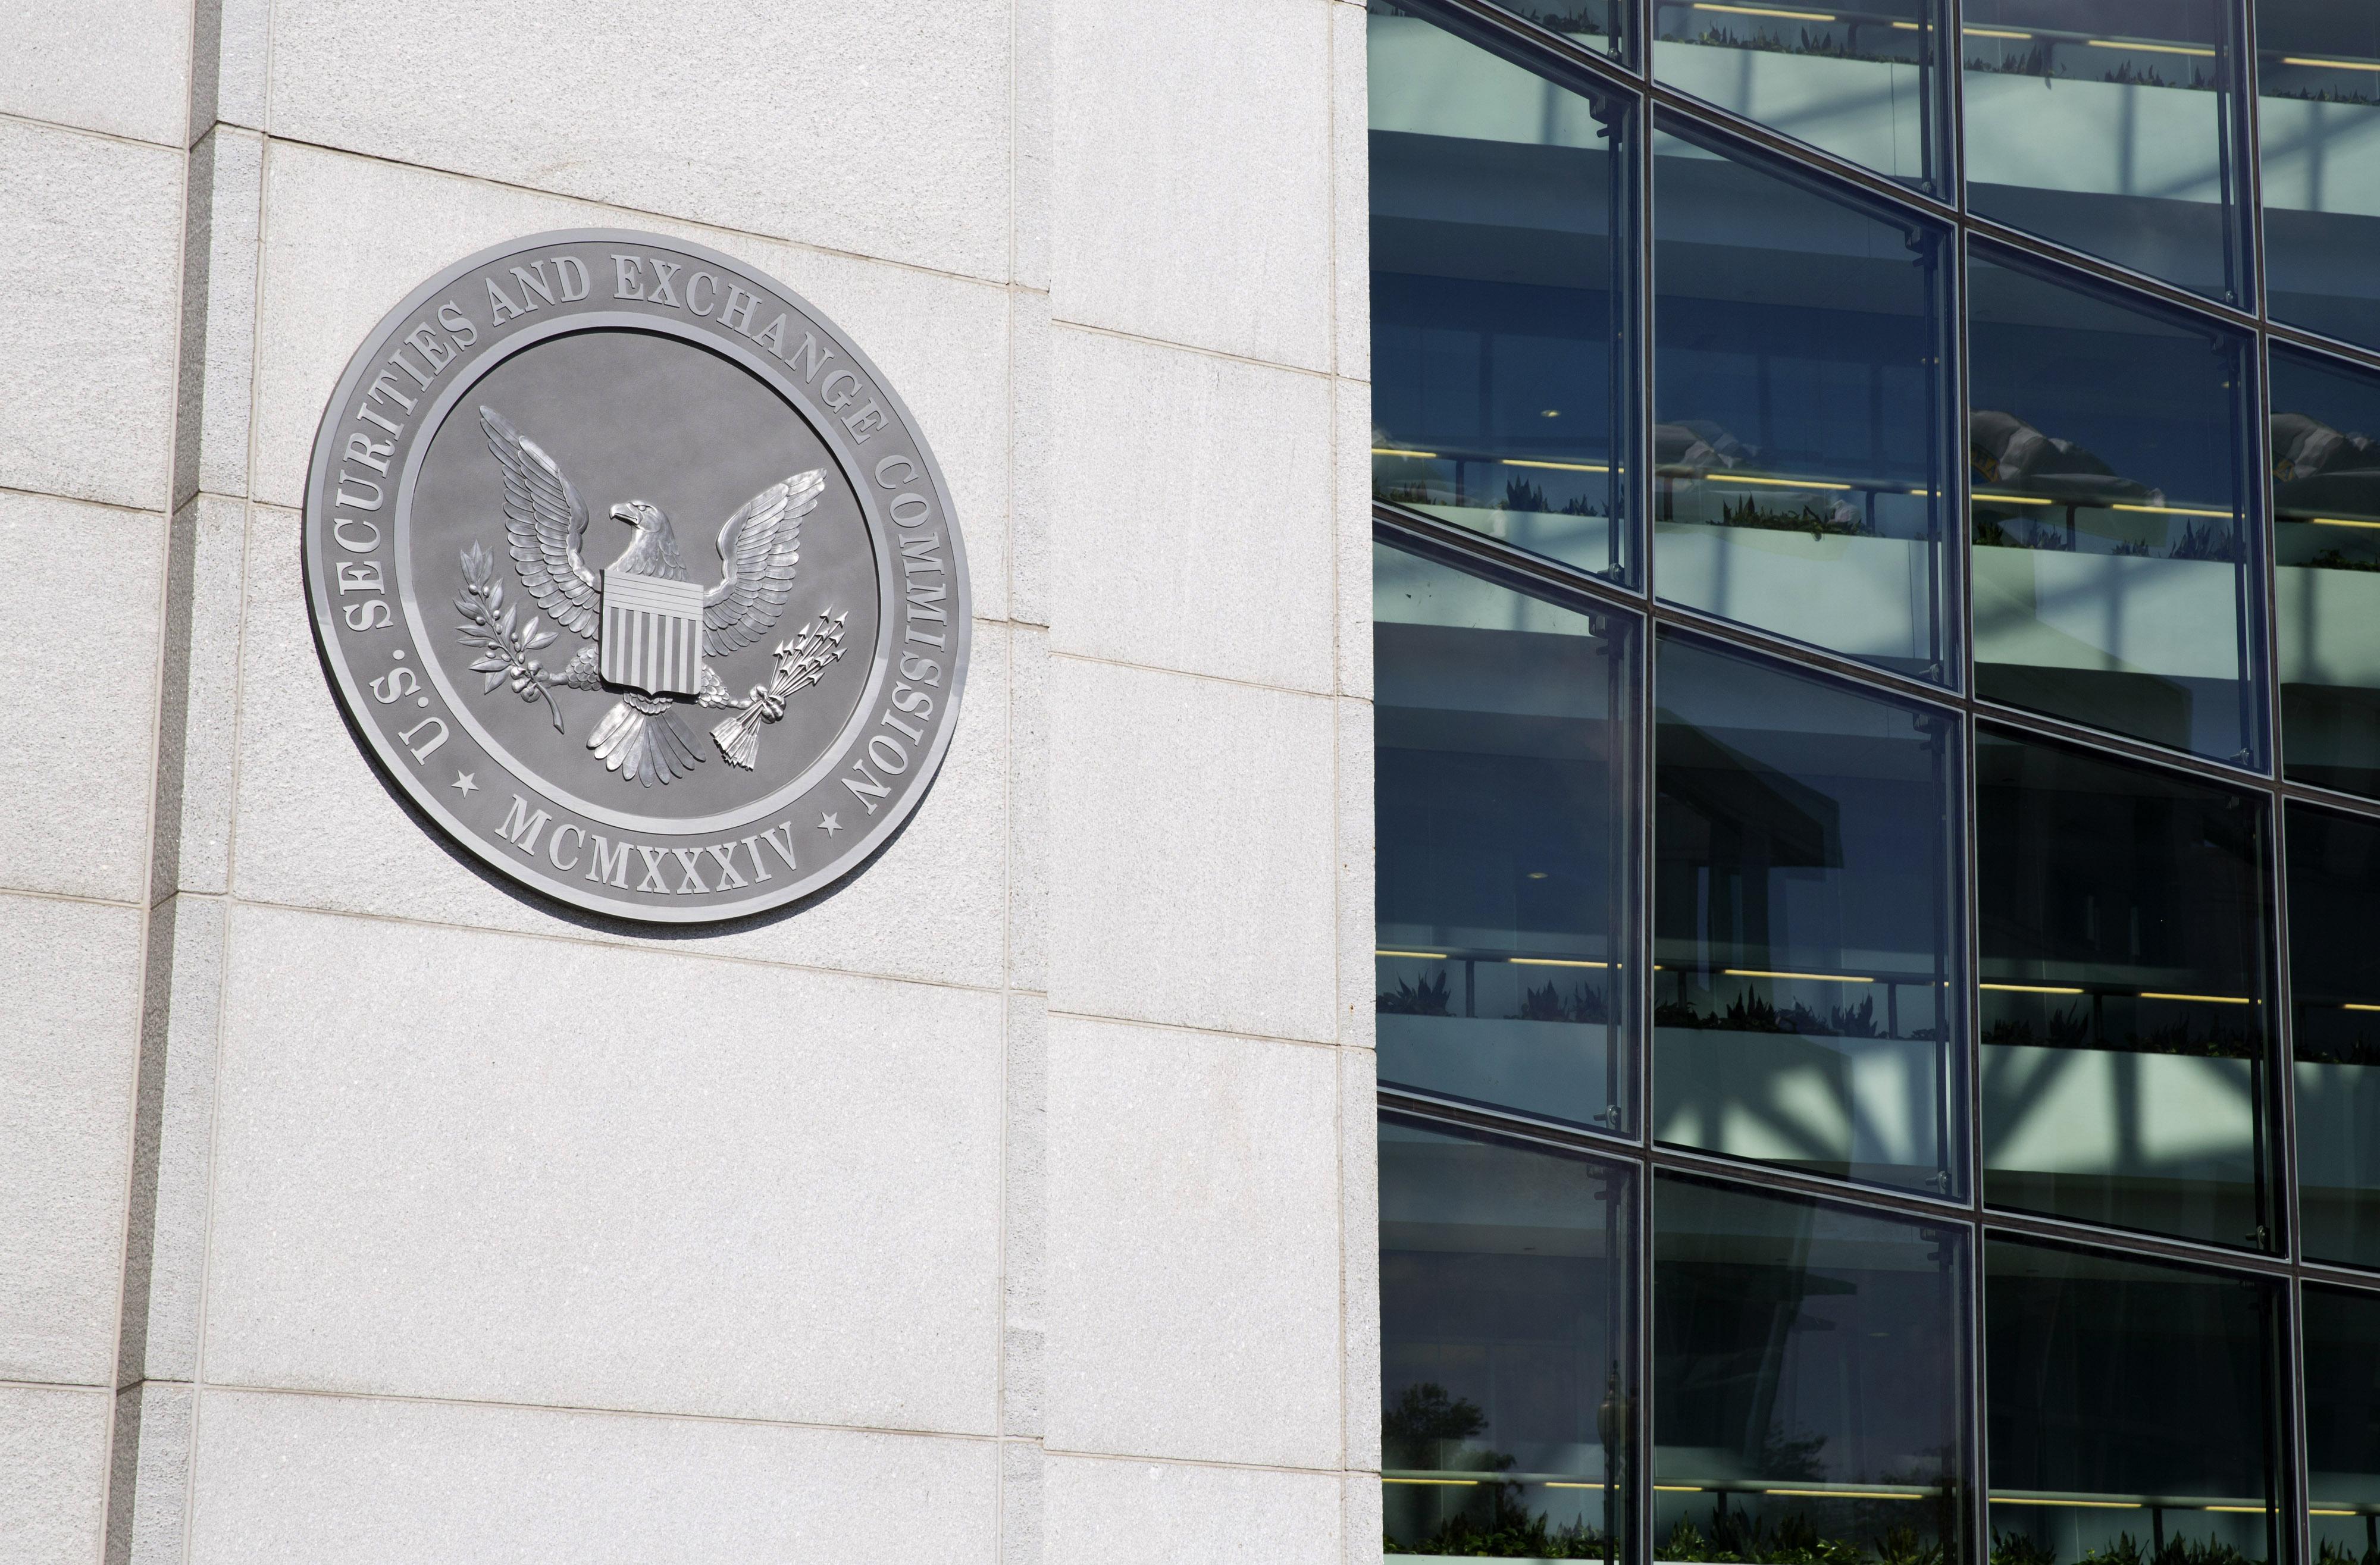 Government Shutdown Begins as Congress Divides on Spending